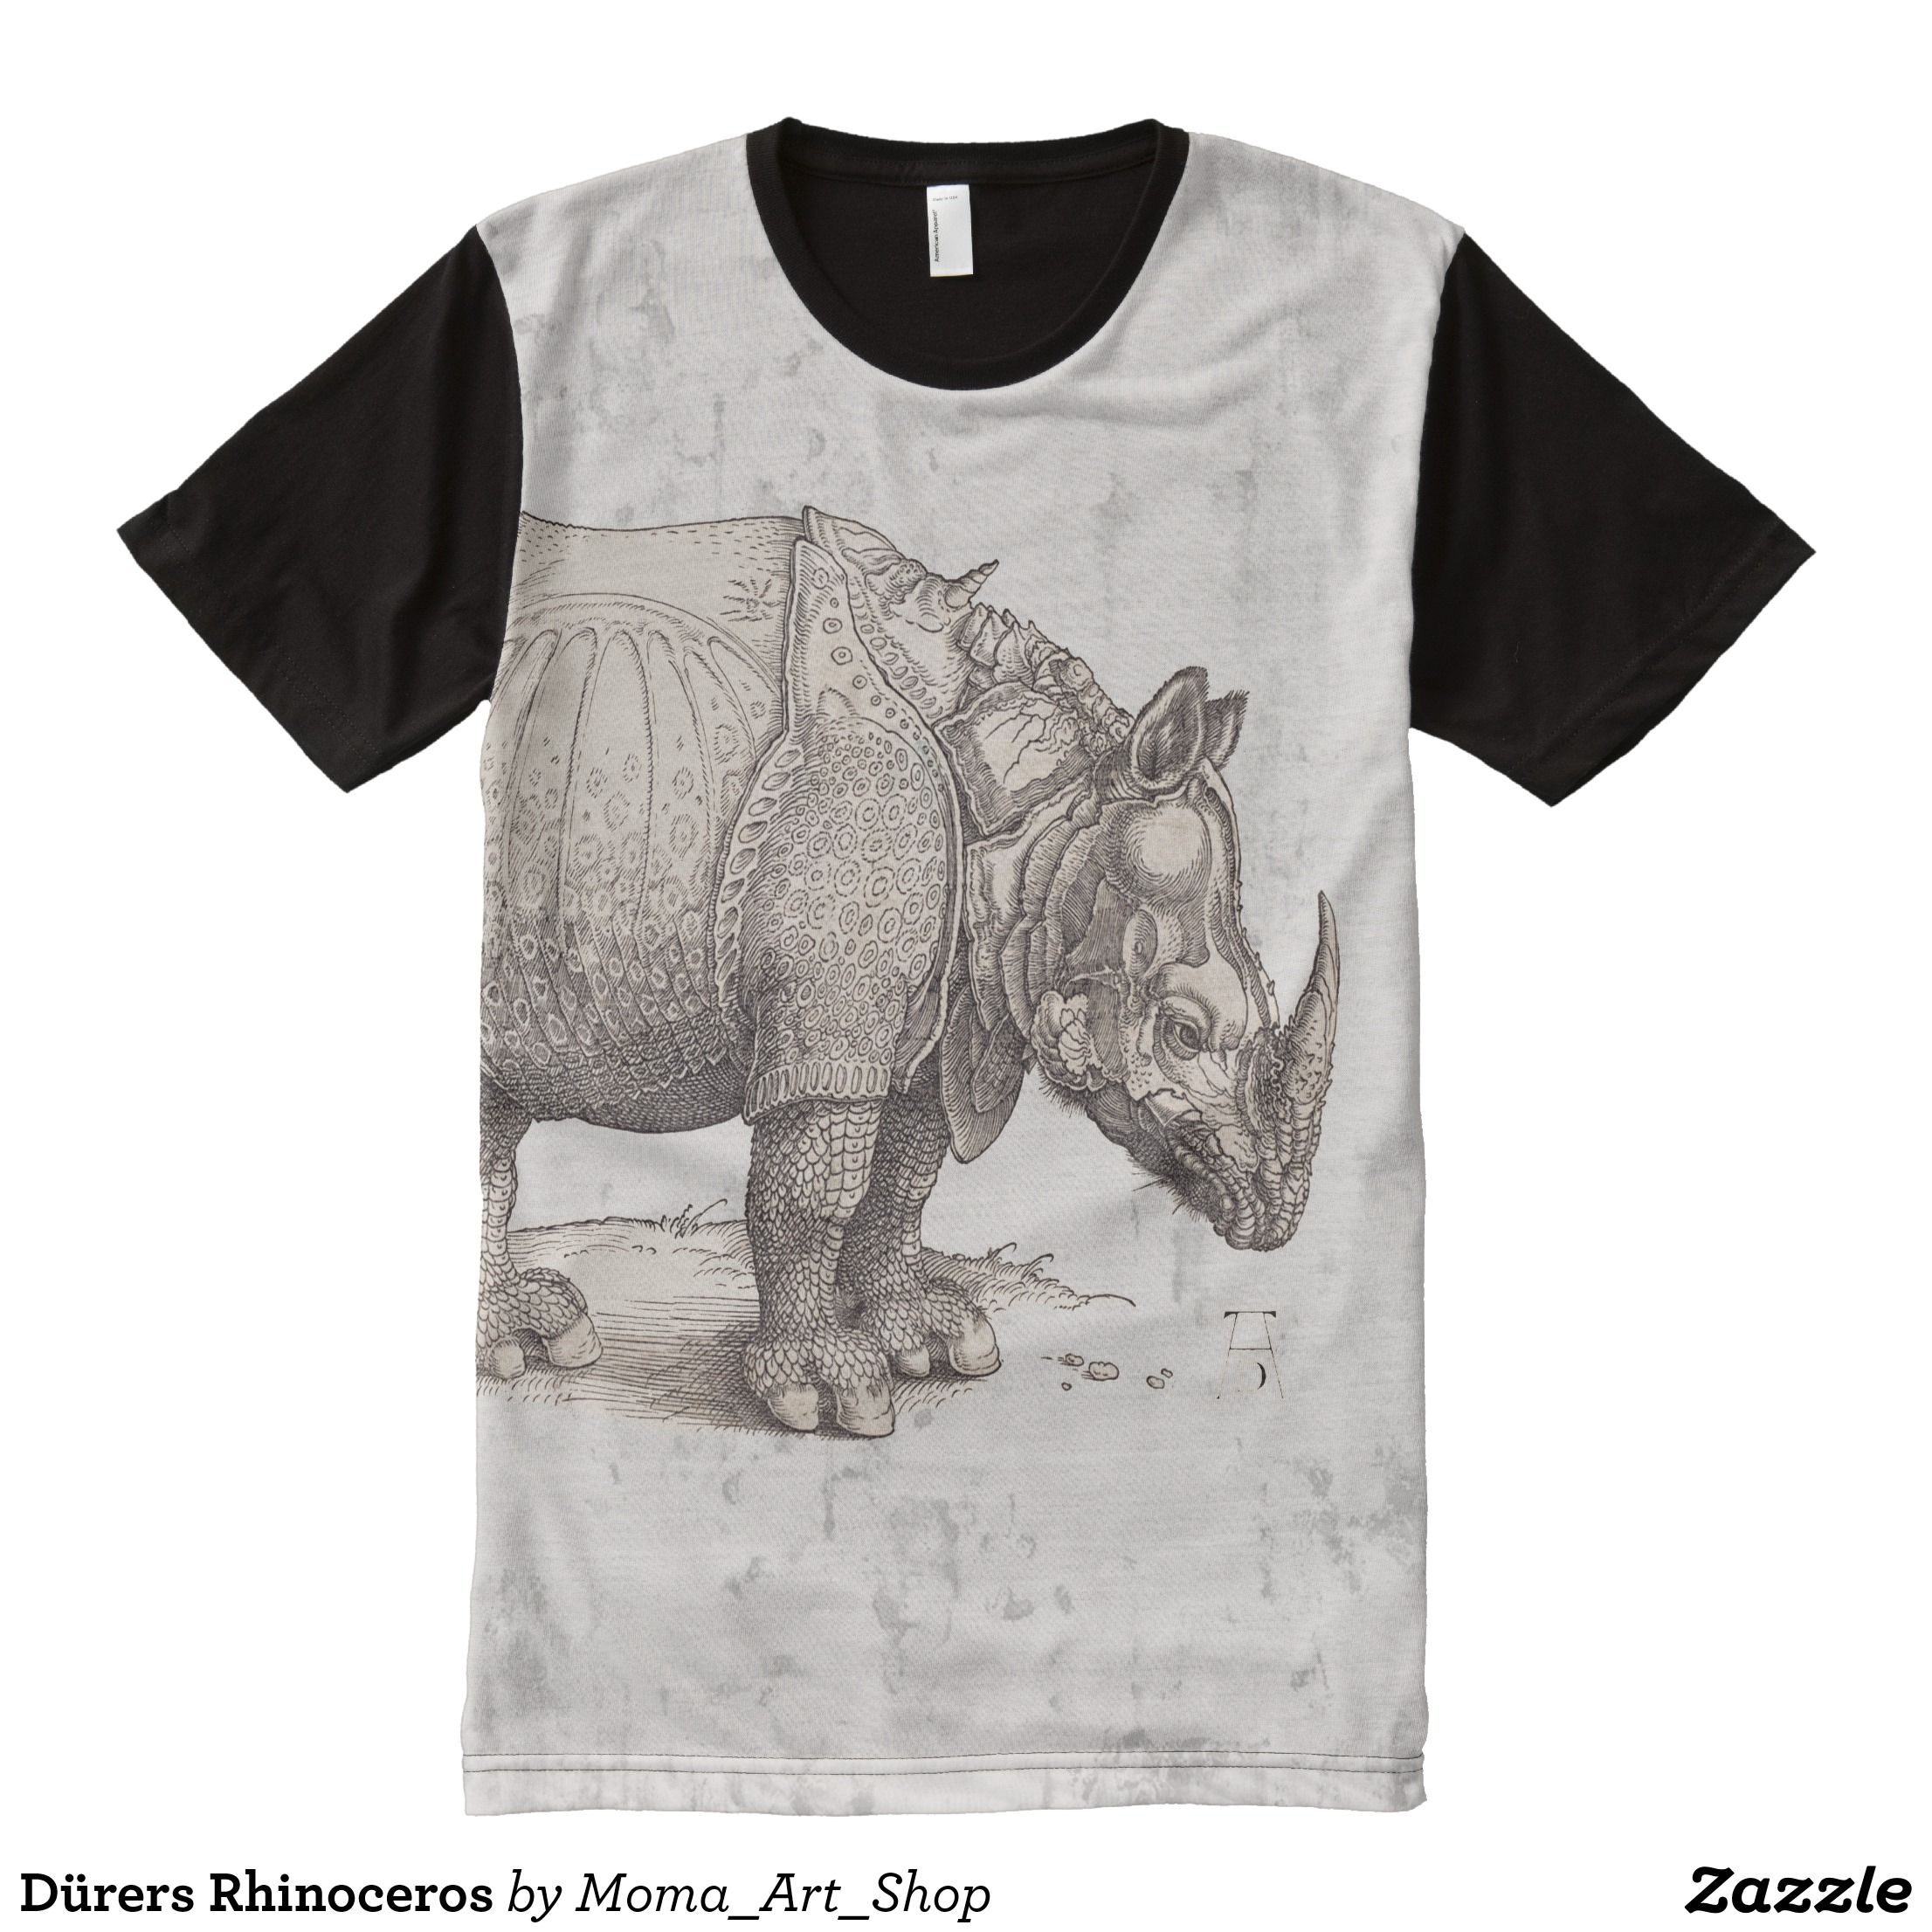 Durers Rhinoceros All Over Print Shirt Zazzle Com Printed Shirts Shirt Designs Shirts